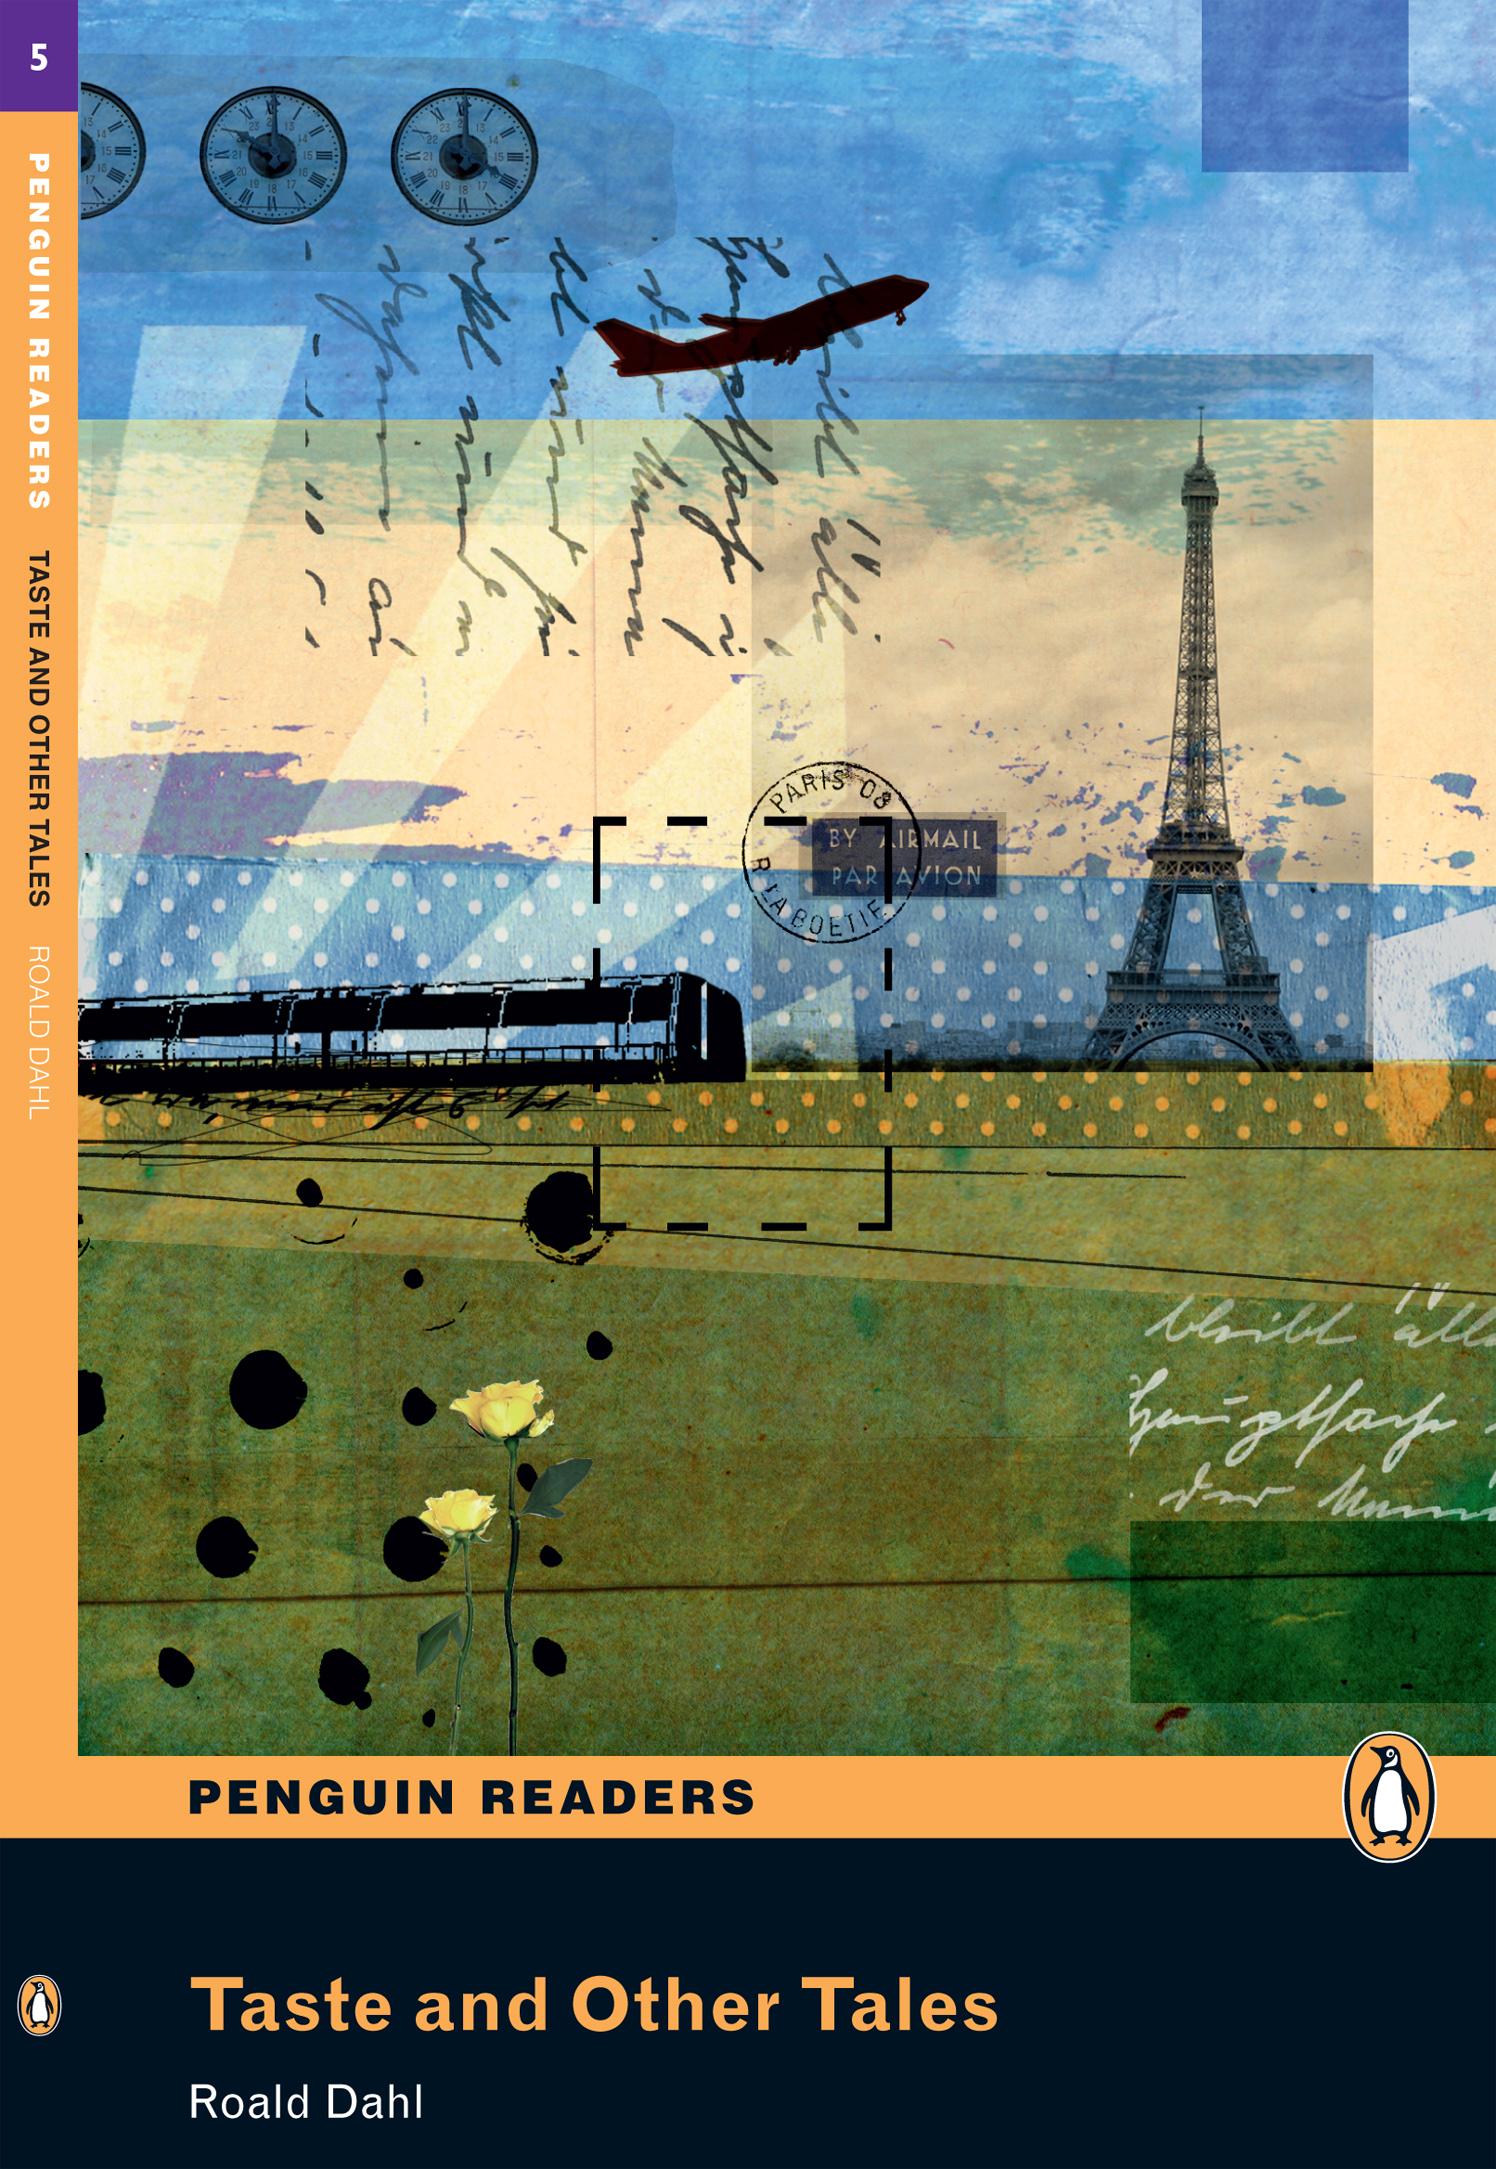 Taste and Other Tales Roald Dahl Penguin Readers